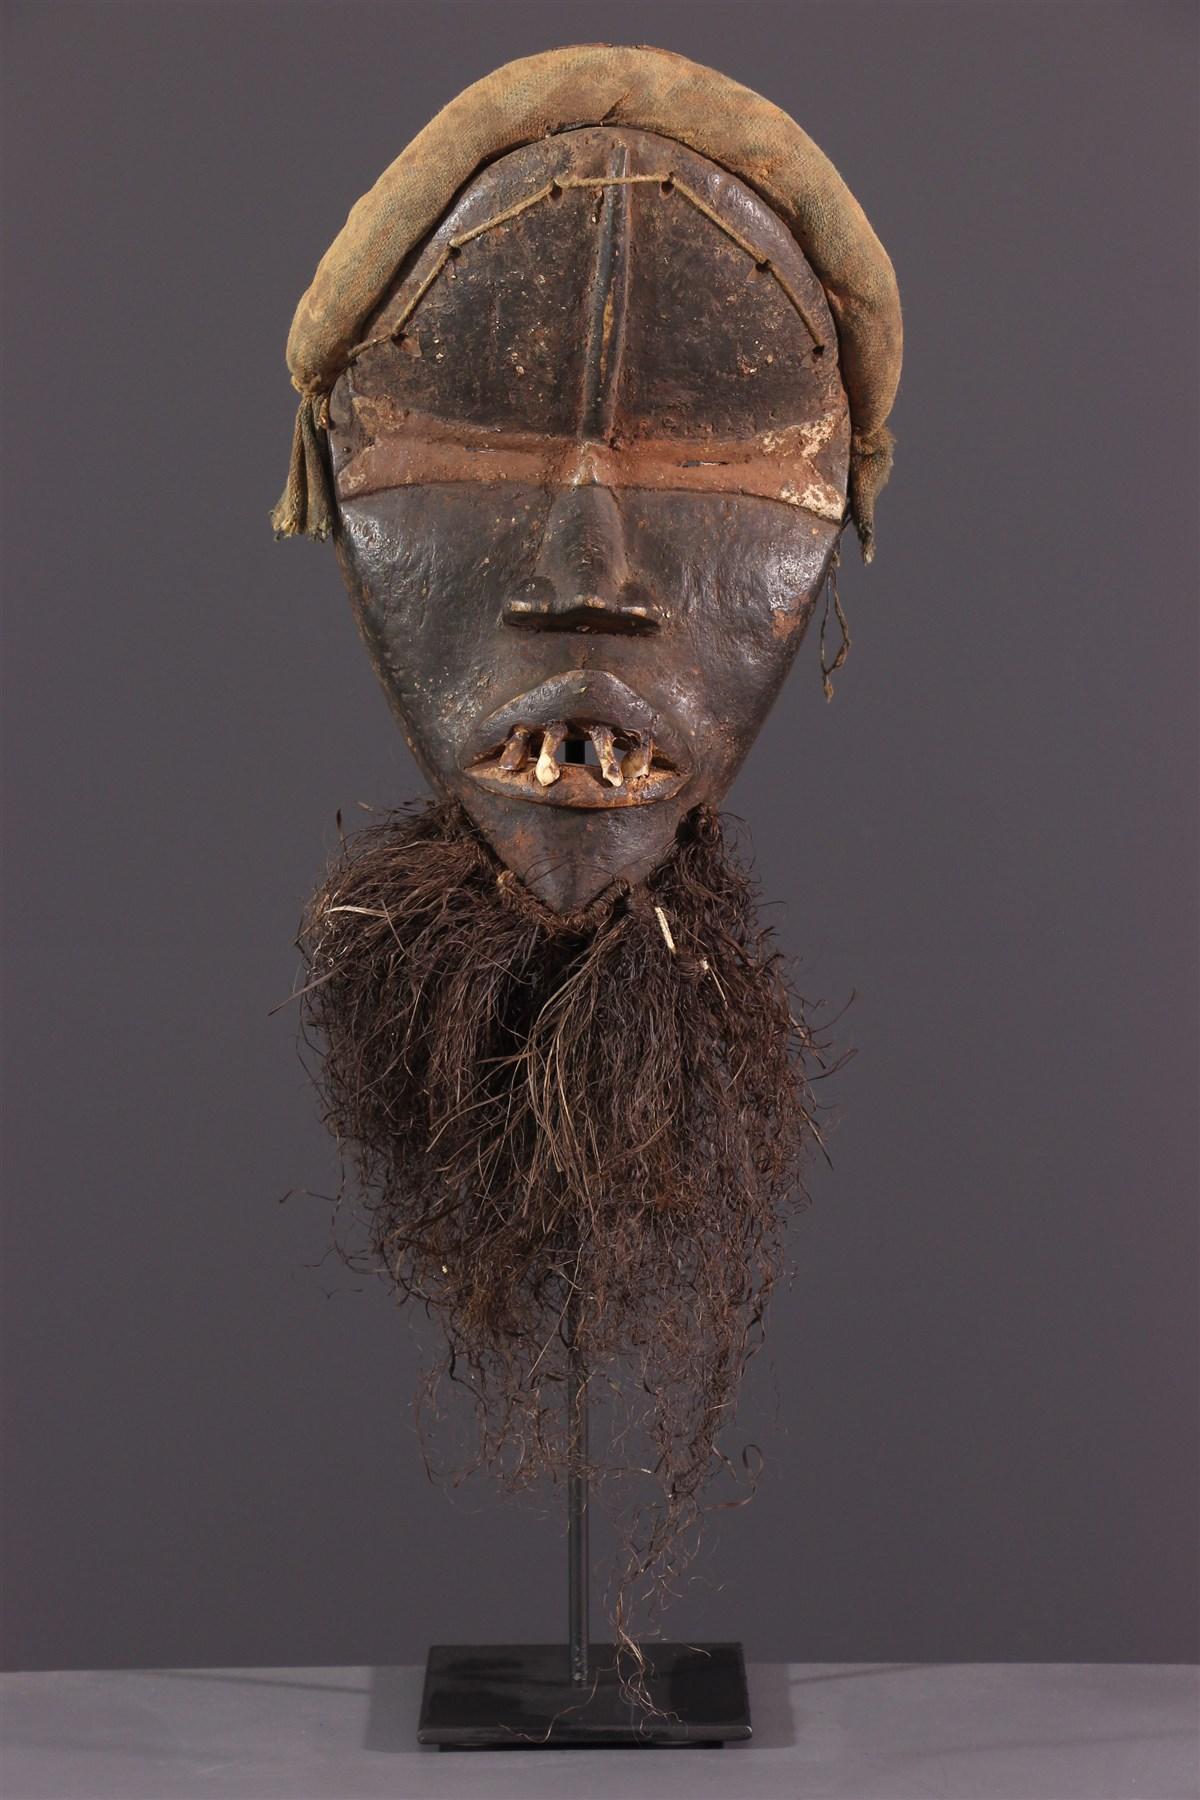 Masque Zei-ge Dan-Mano - Art africain